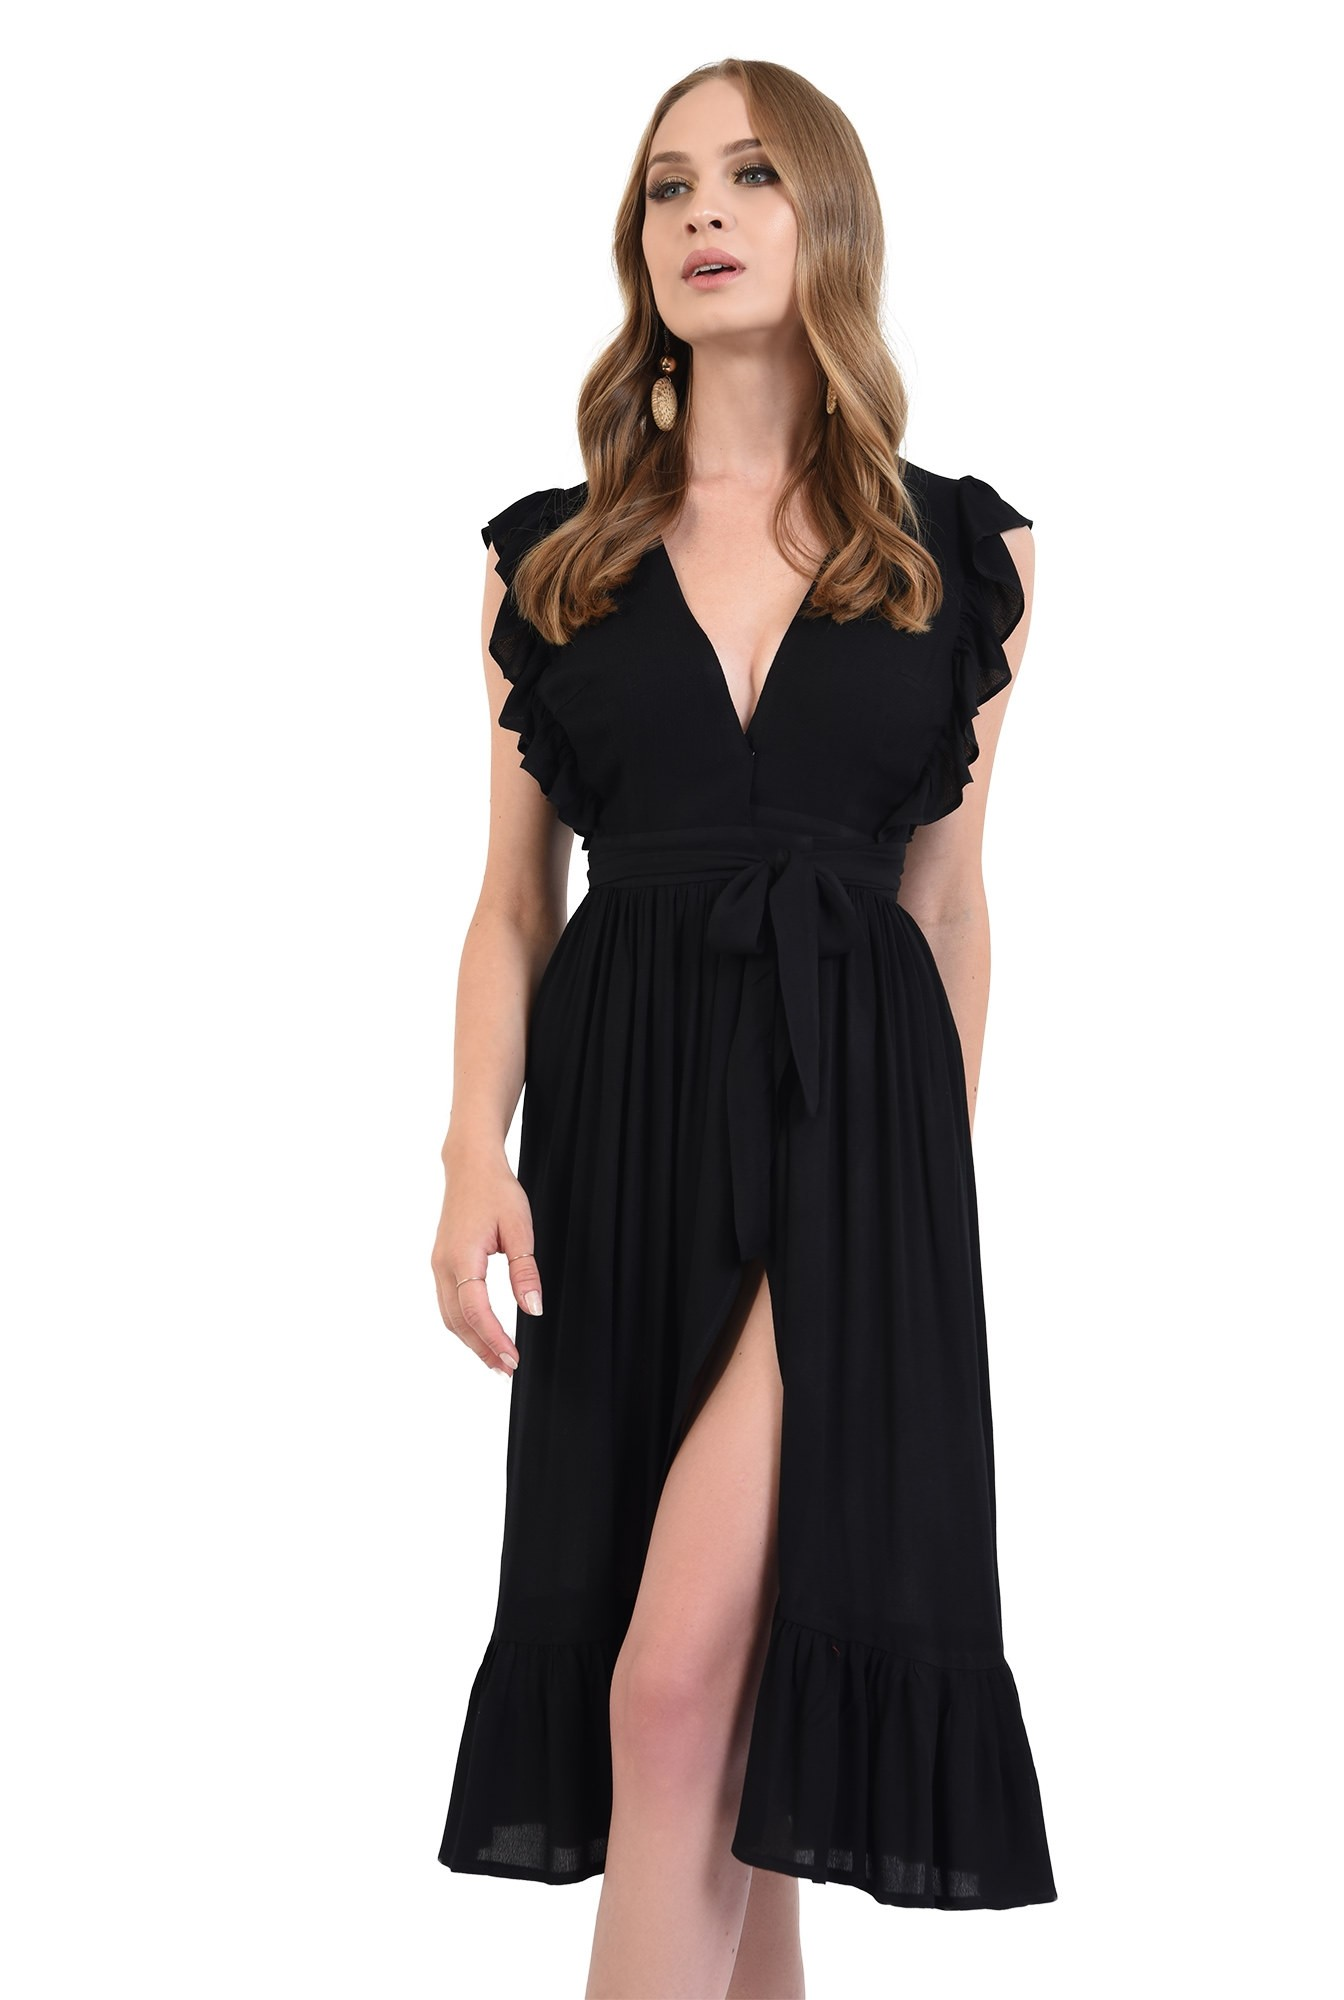 3 - 360 - rochie neagra, petrecuta, cu volan la umeri, Poema